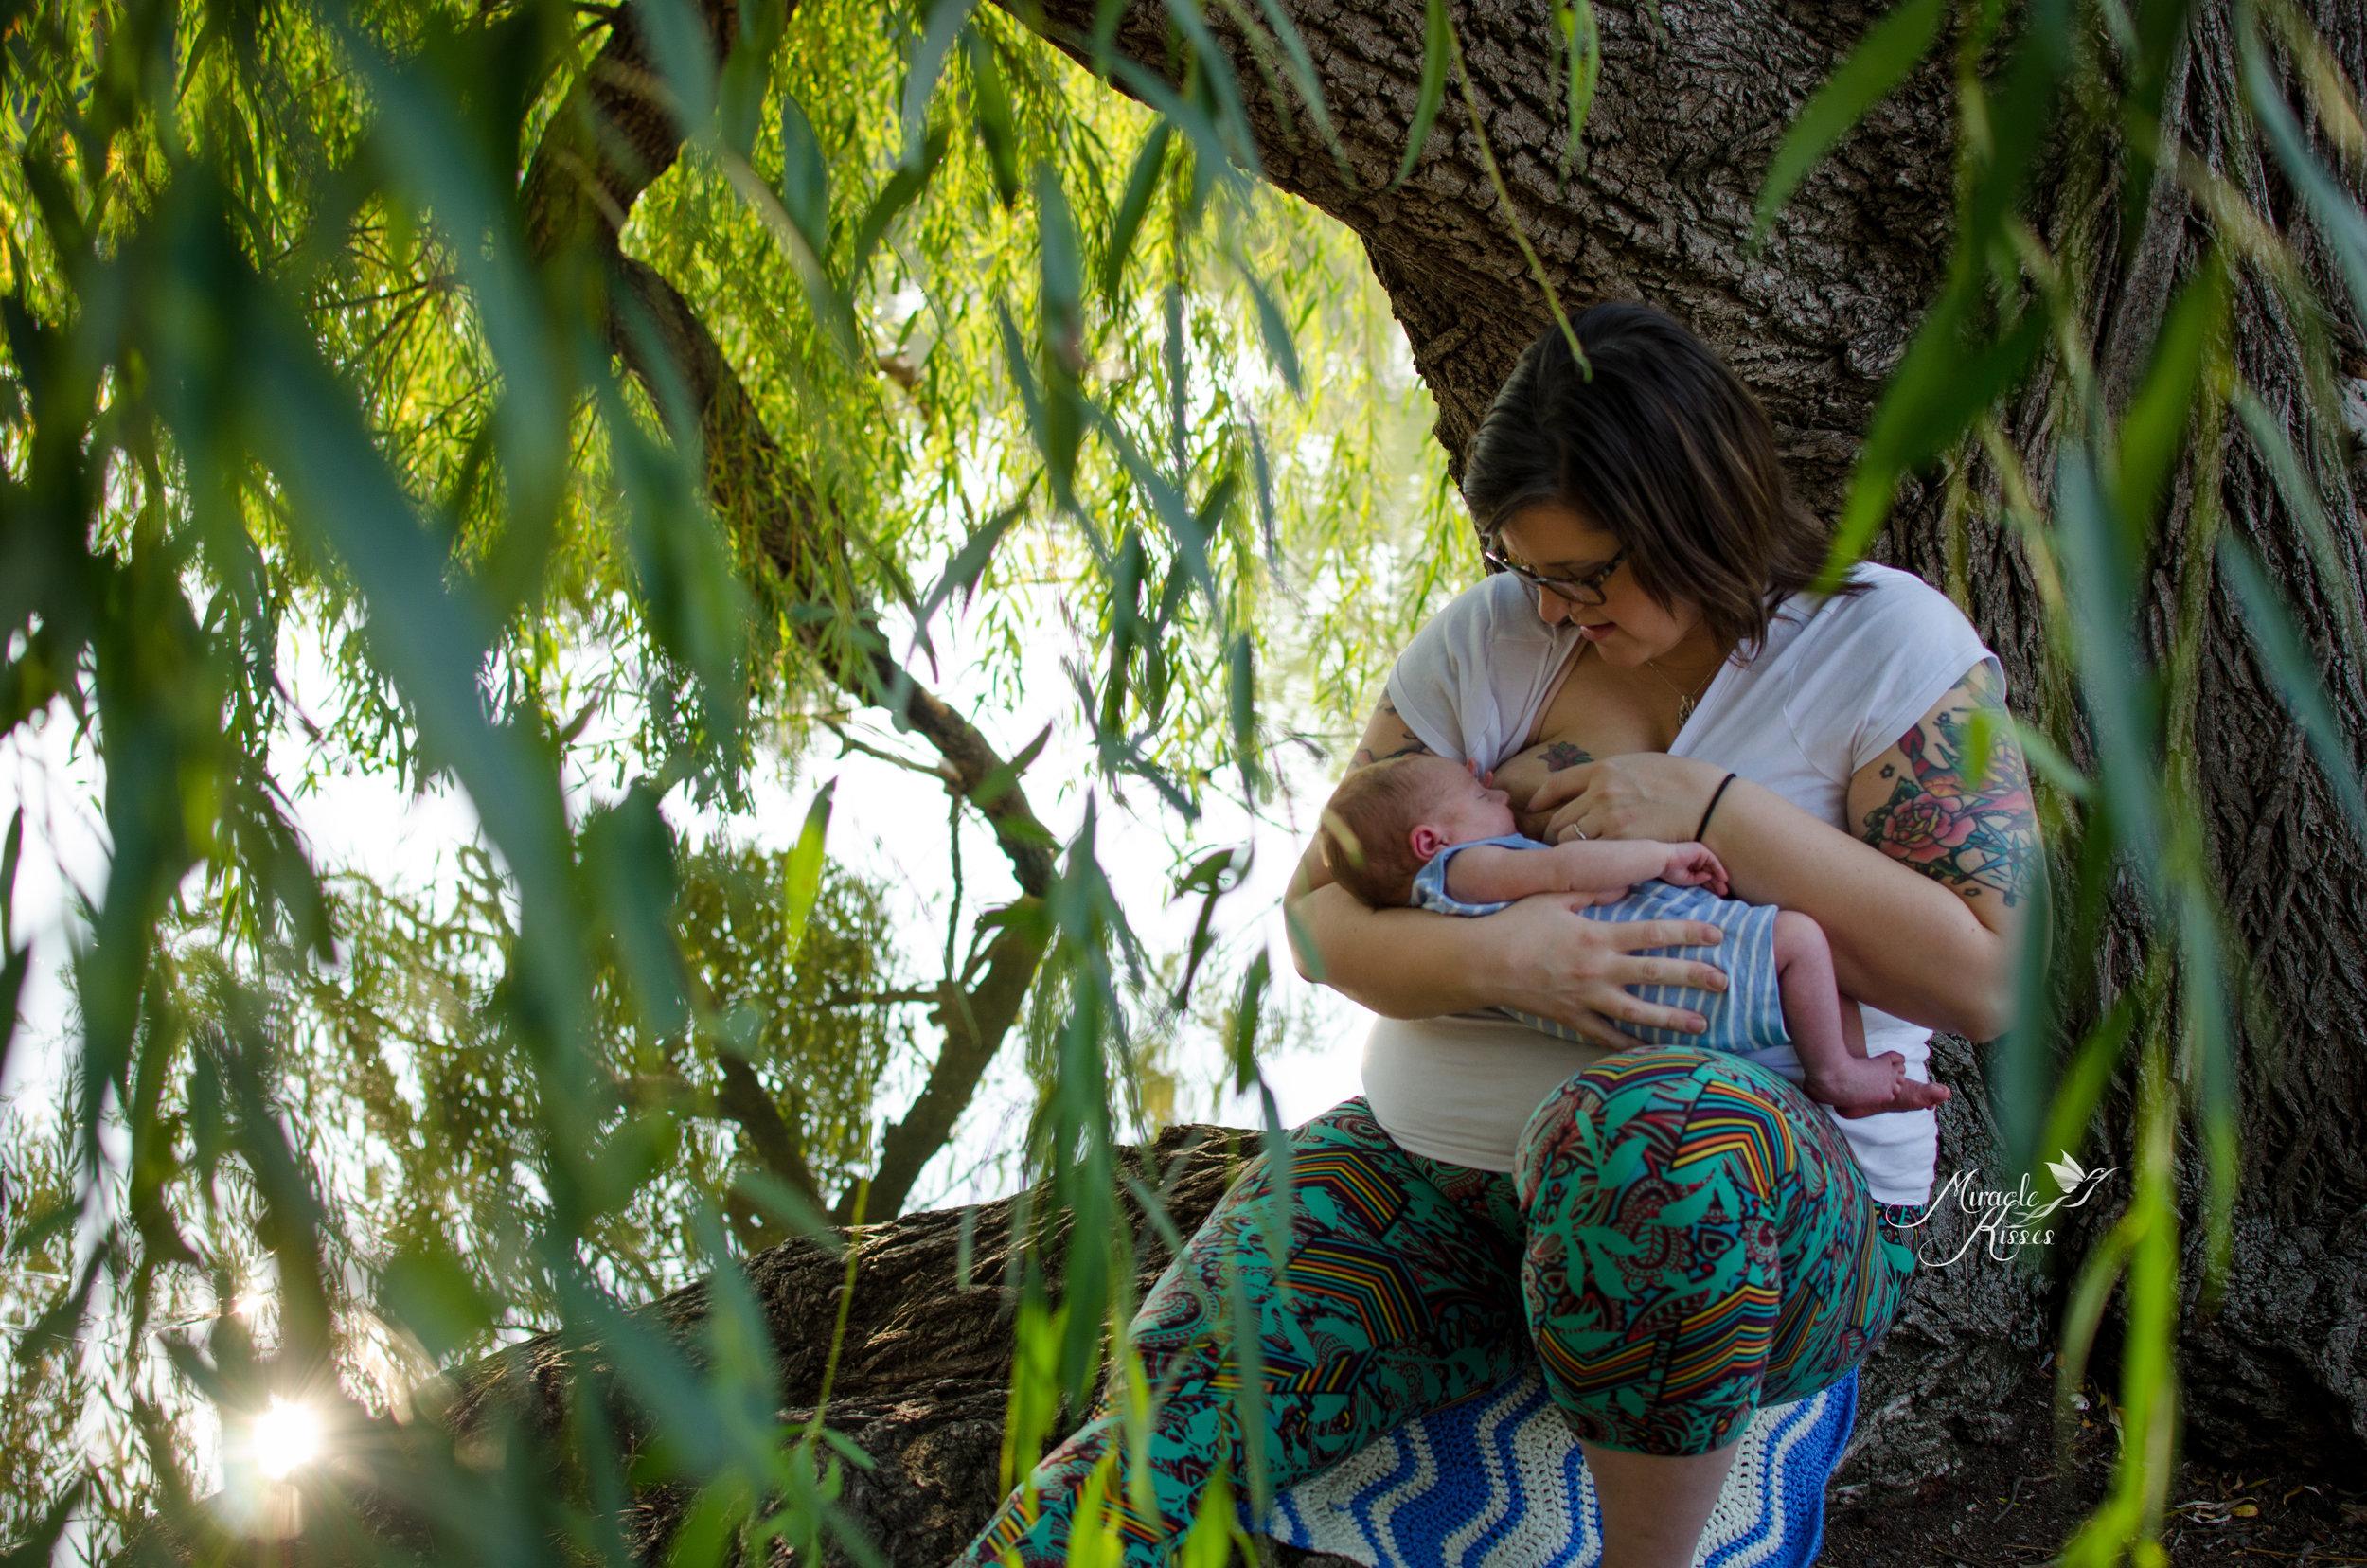 breastfeeding in nature, outdoor newborn photography, colorado bond project